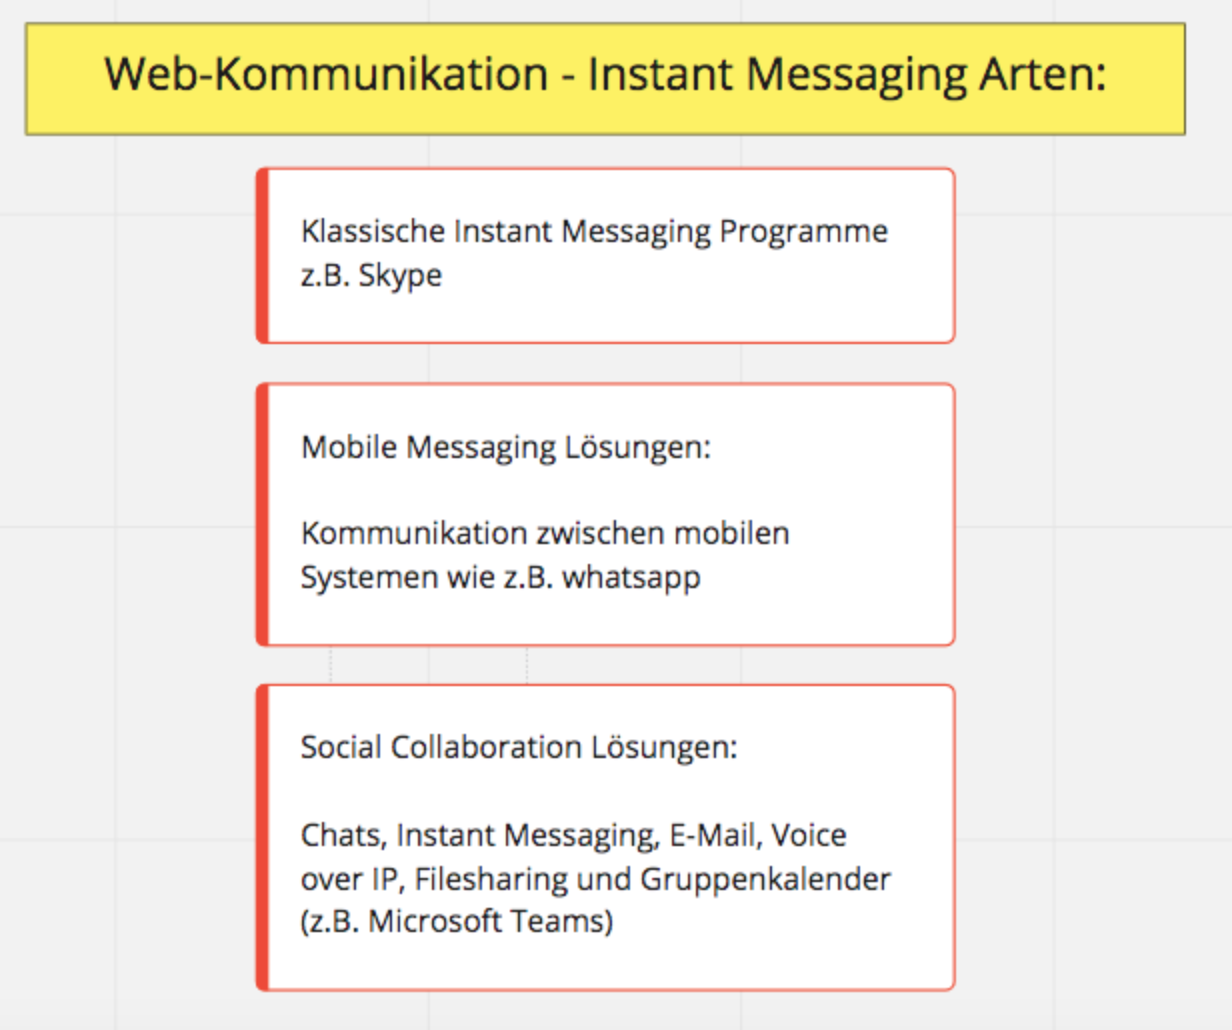 Web-Kommunikationsarten